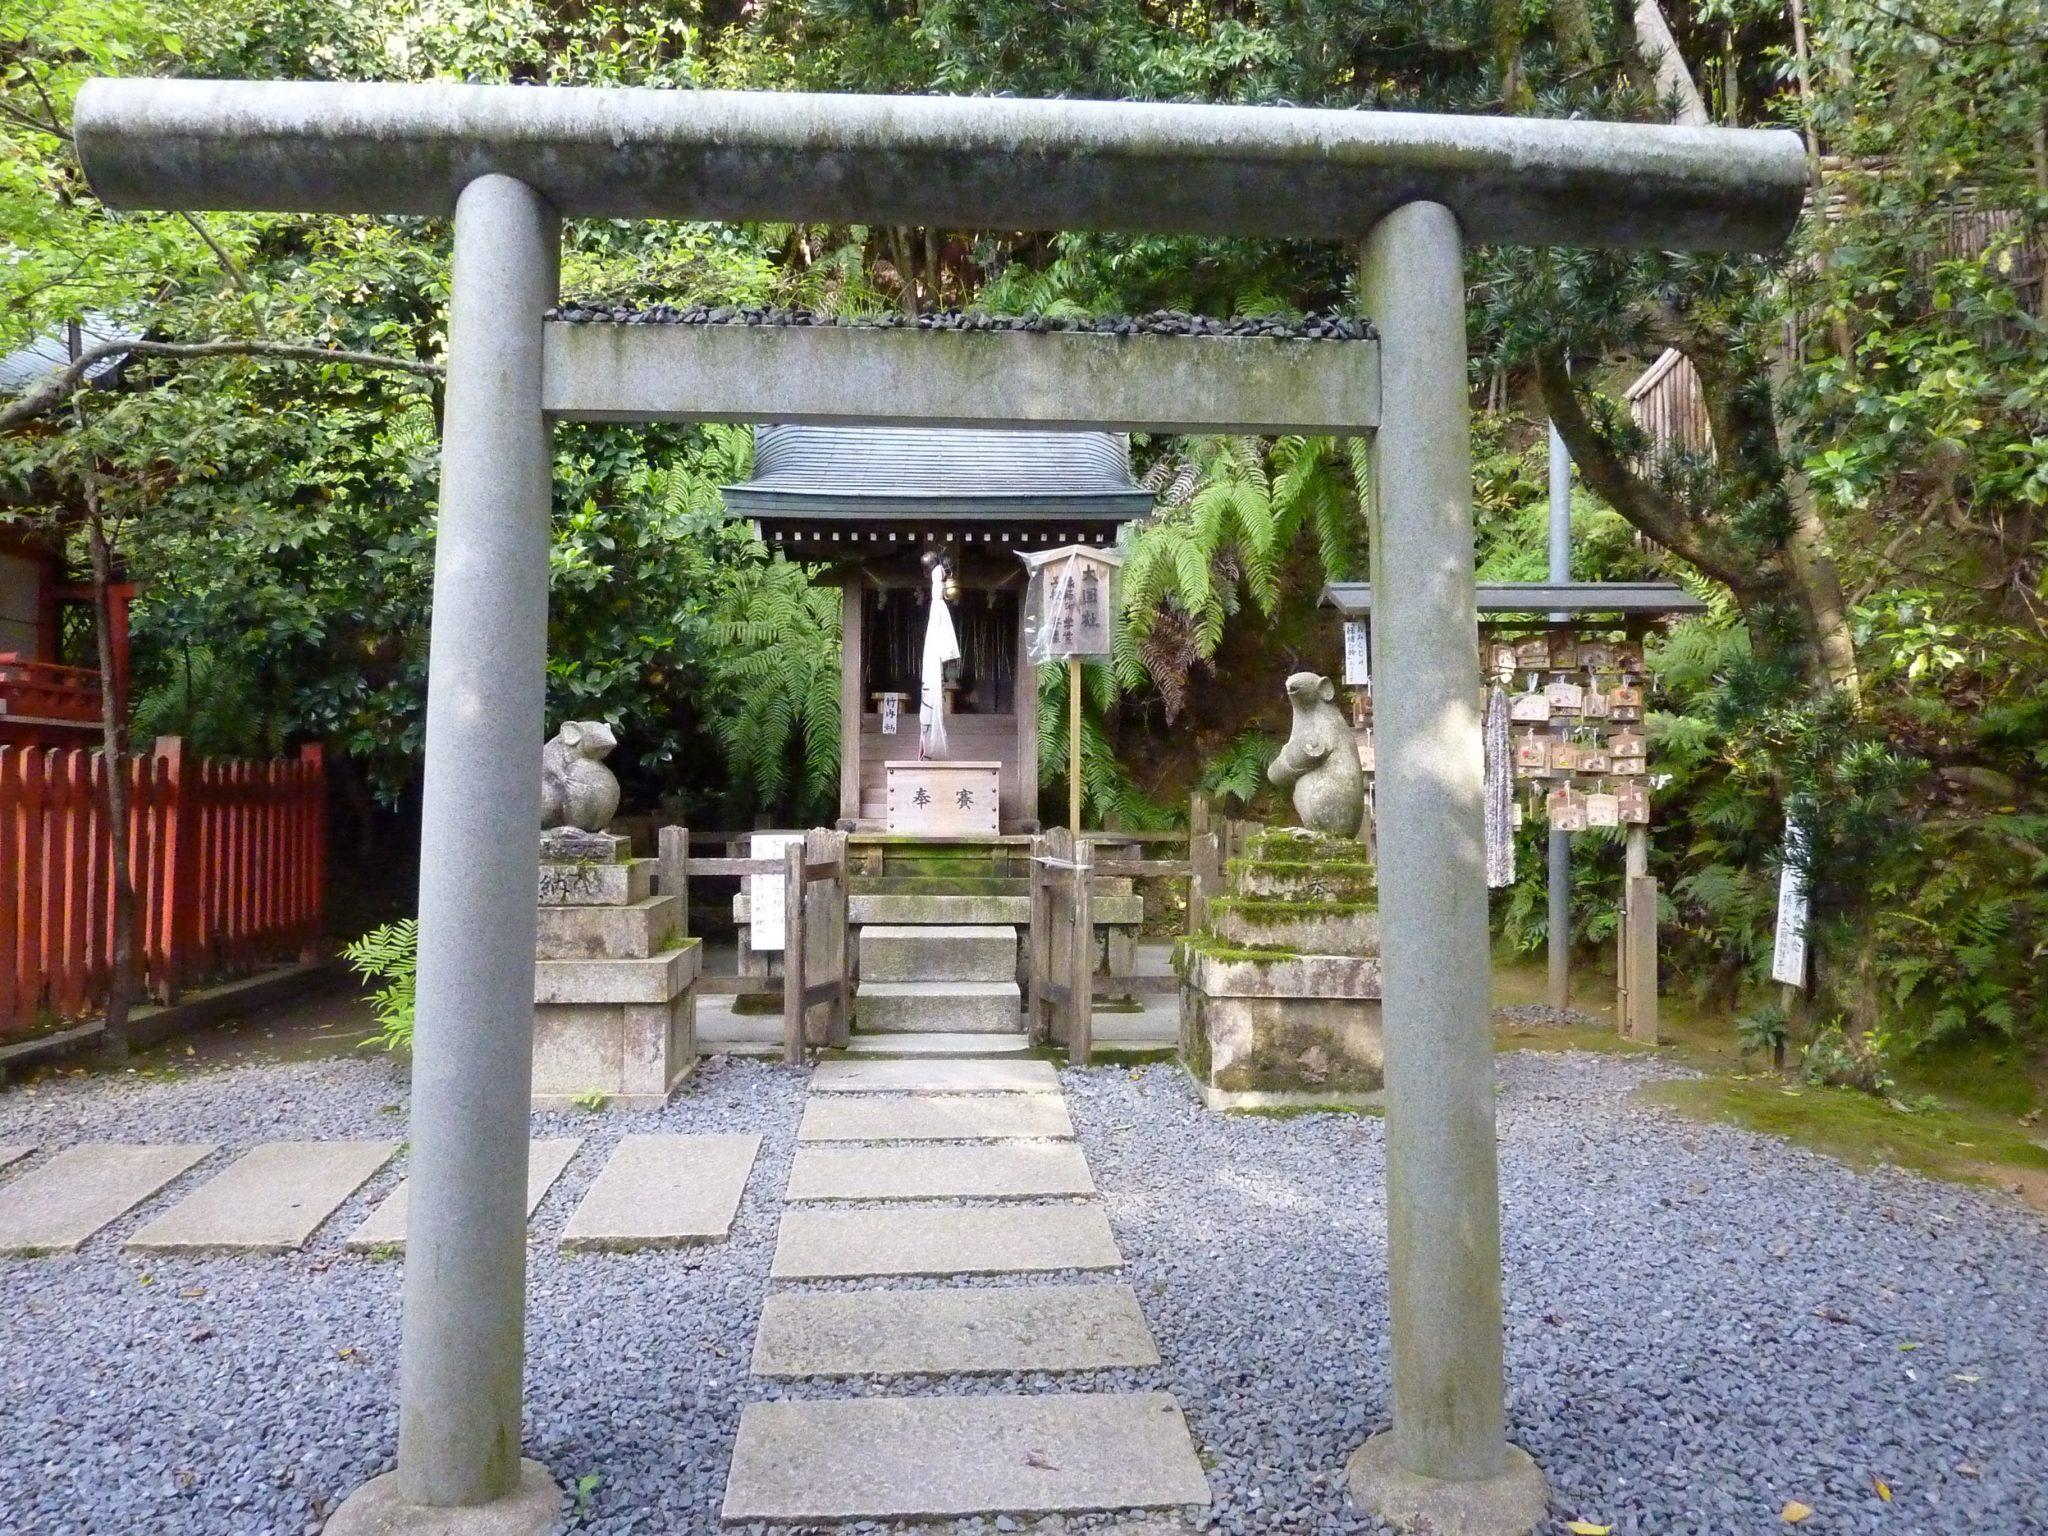 Shinto shrine. Photo: Cecilia Herrzog